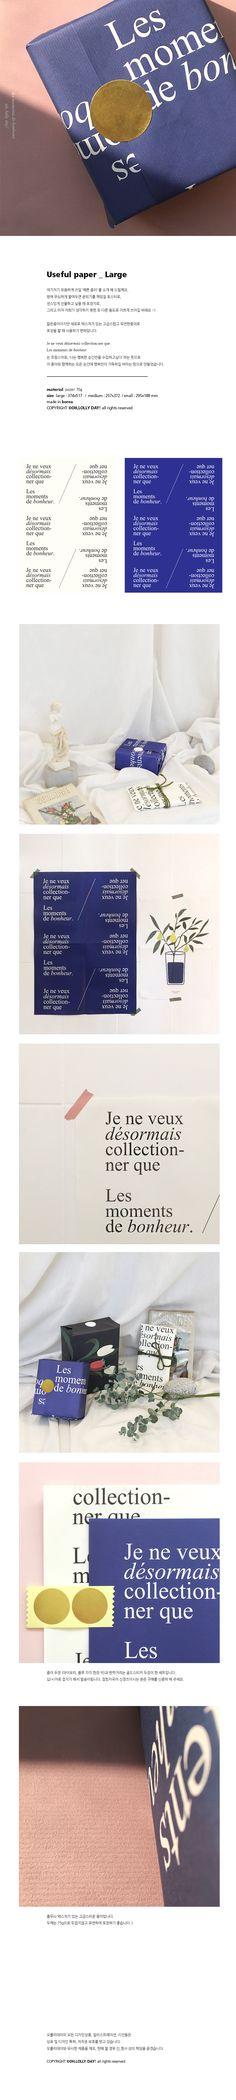 O,LD! useful paper _ Large Packaging Box Design, Brand Packaging, Label Design, Branding Design, Packaging Inspiration, Design Inspiration, Book Design, Web Design, Cosmetic Design